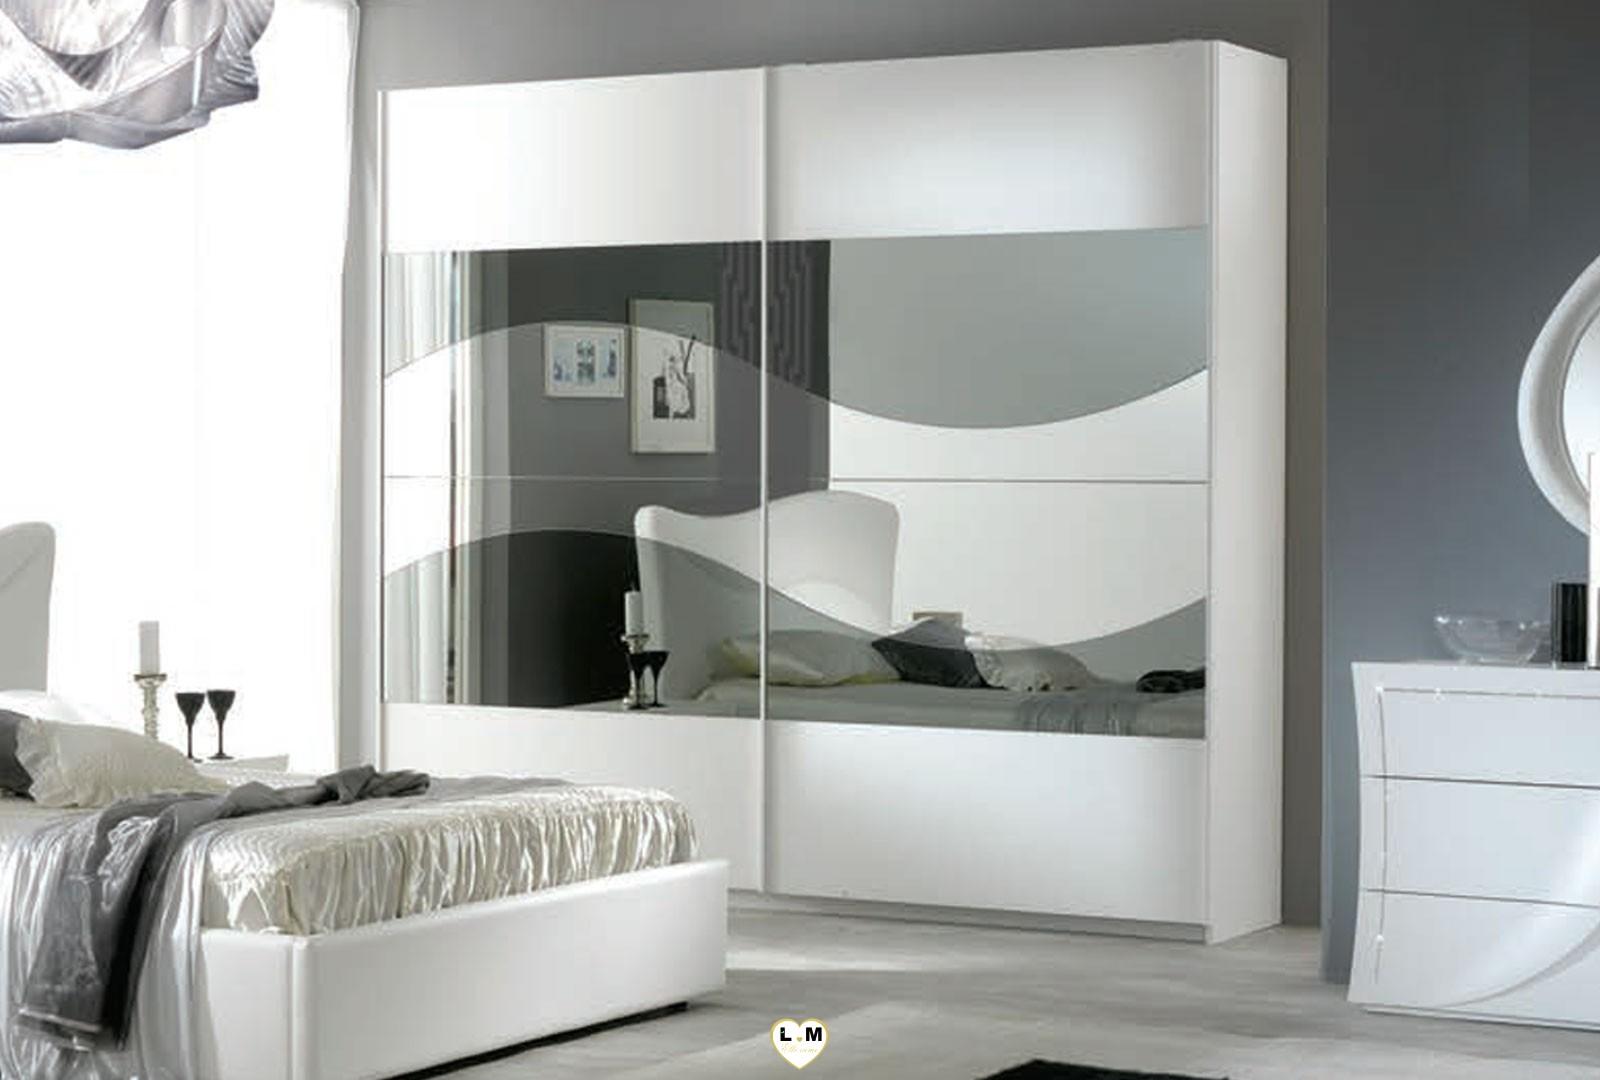 Tabata laque blanc ensemble chambre a coucher design - Chambre a coucher conforama blanc laque ...